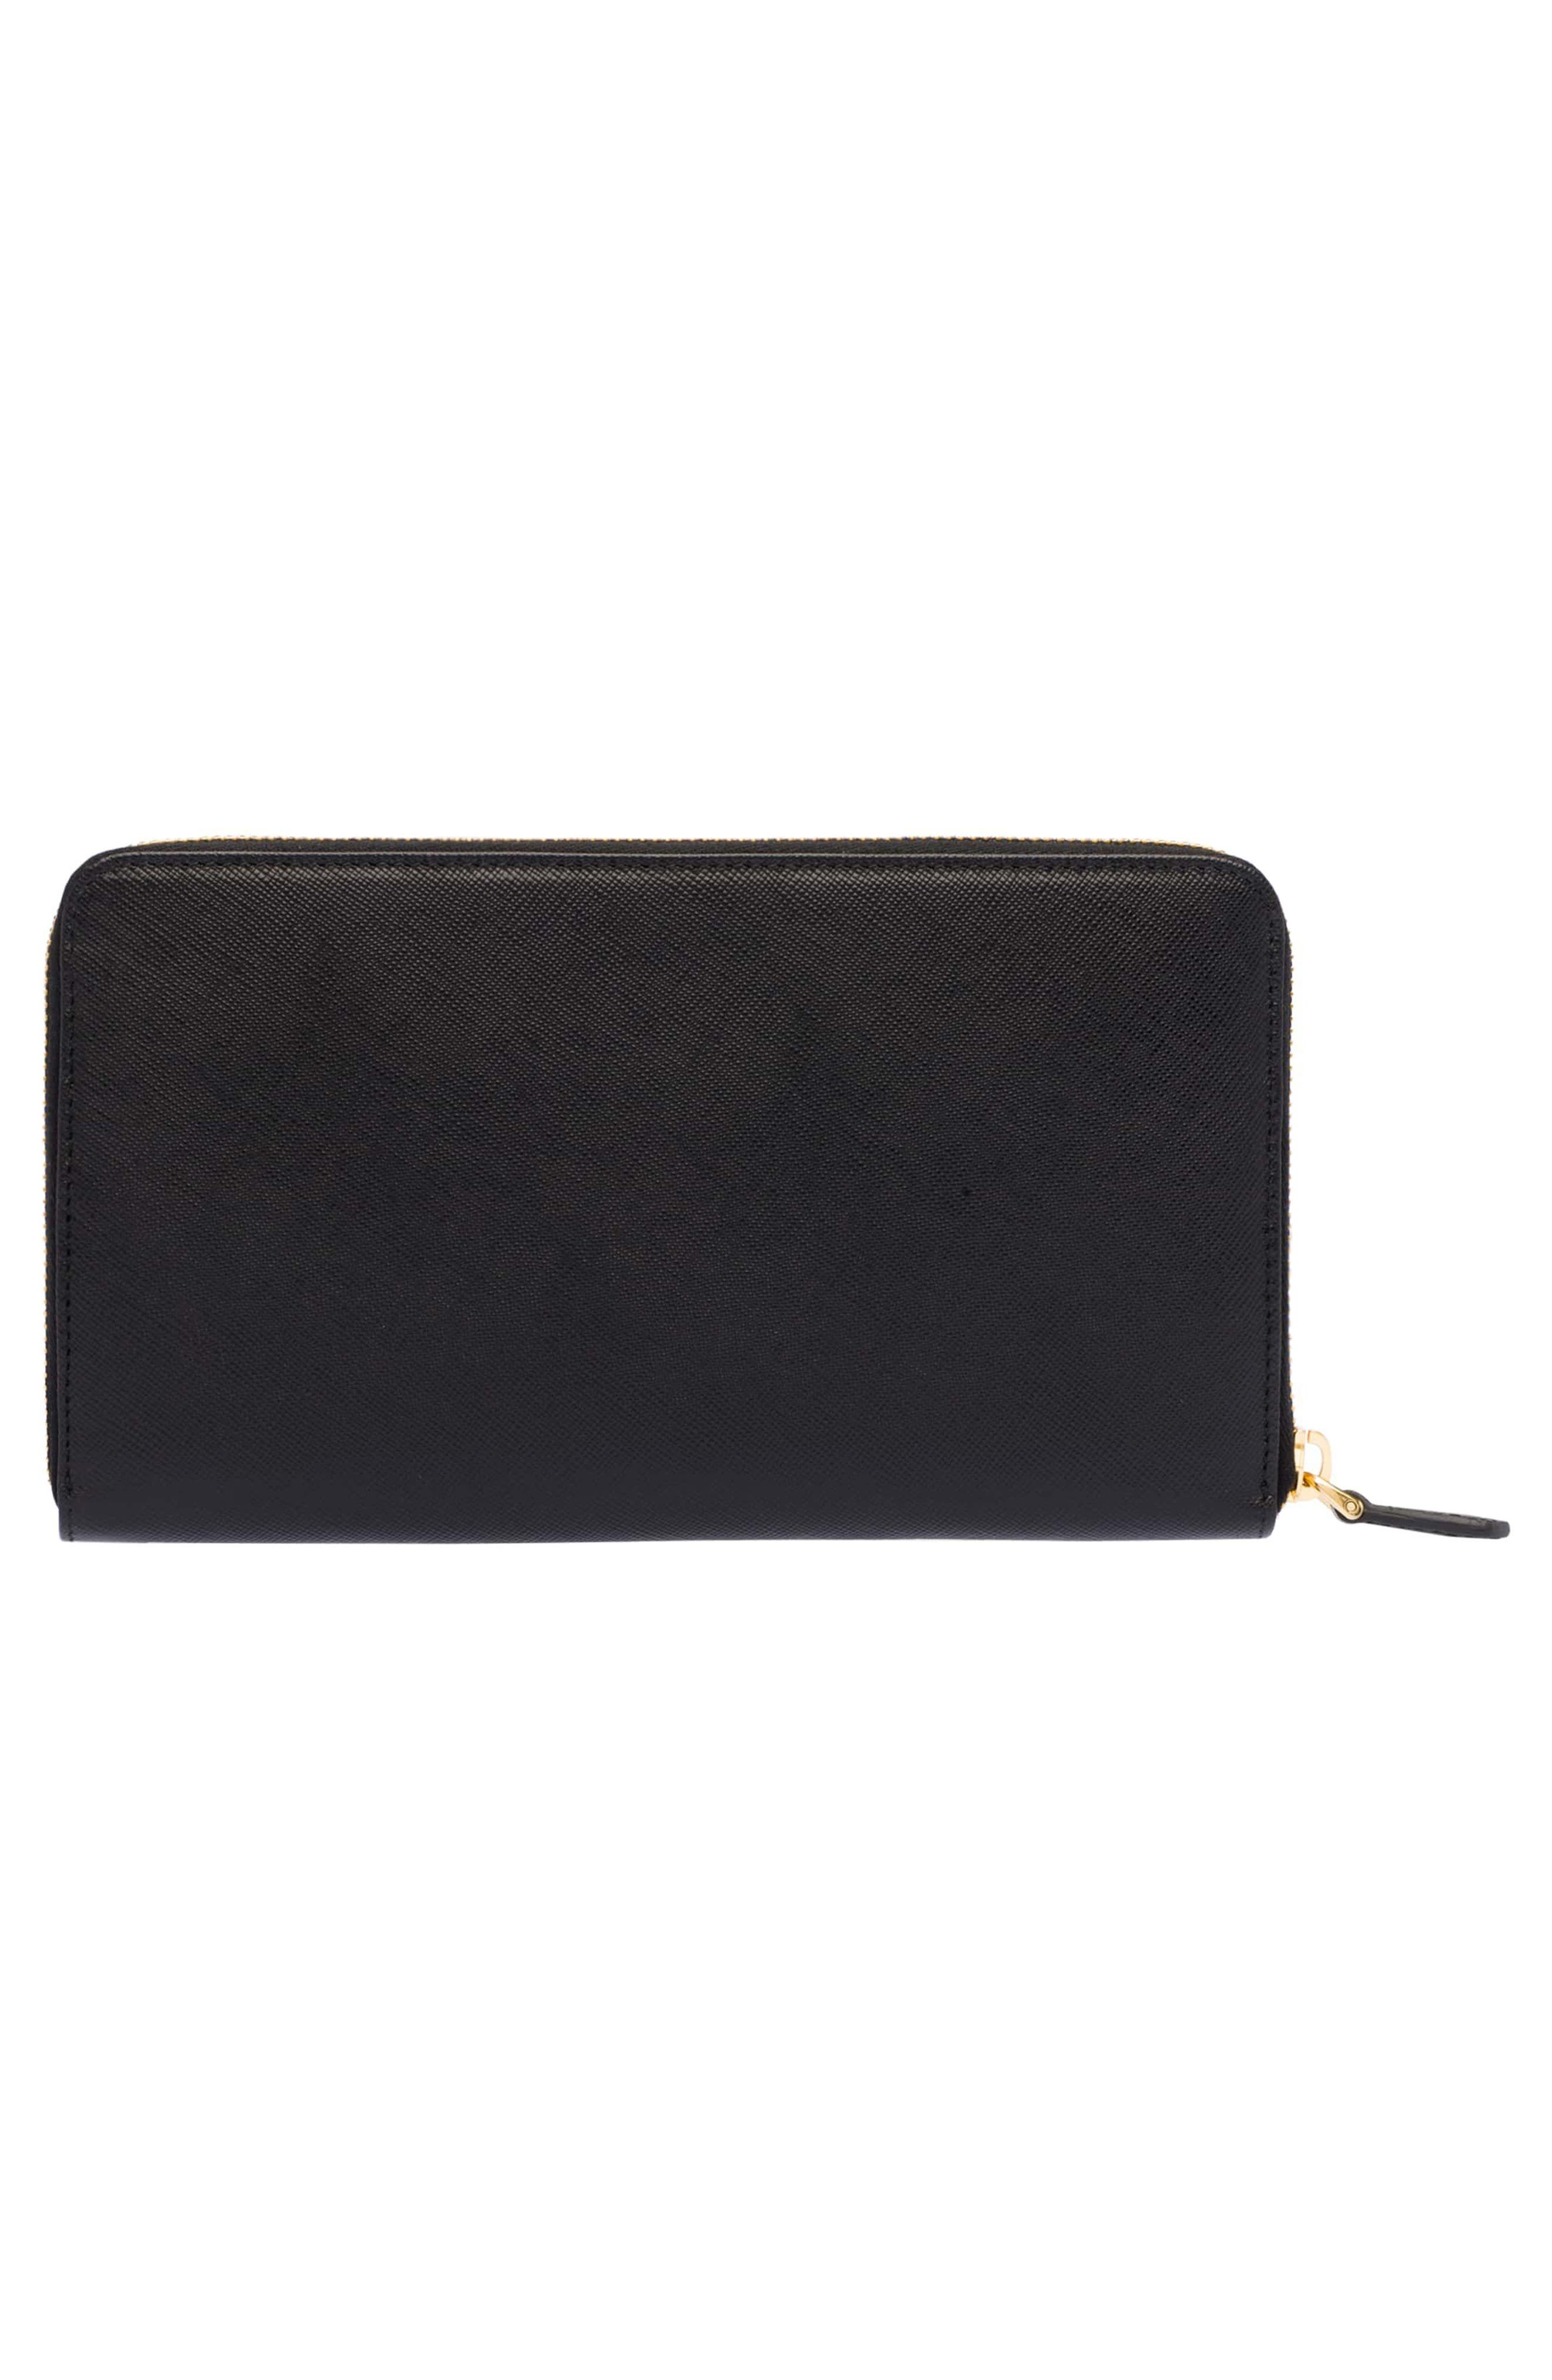 Oro Saffiano Leather Zip Around Wallet,                             Alternate thumbnail 3, color,                             001